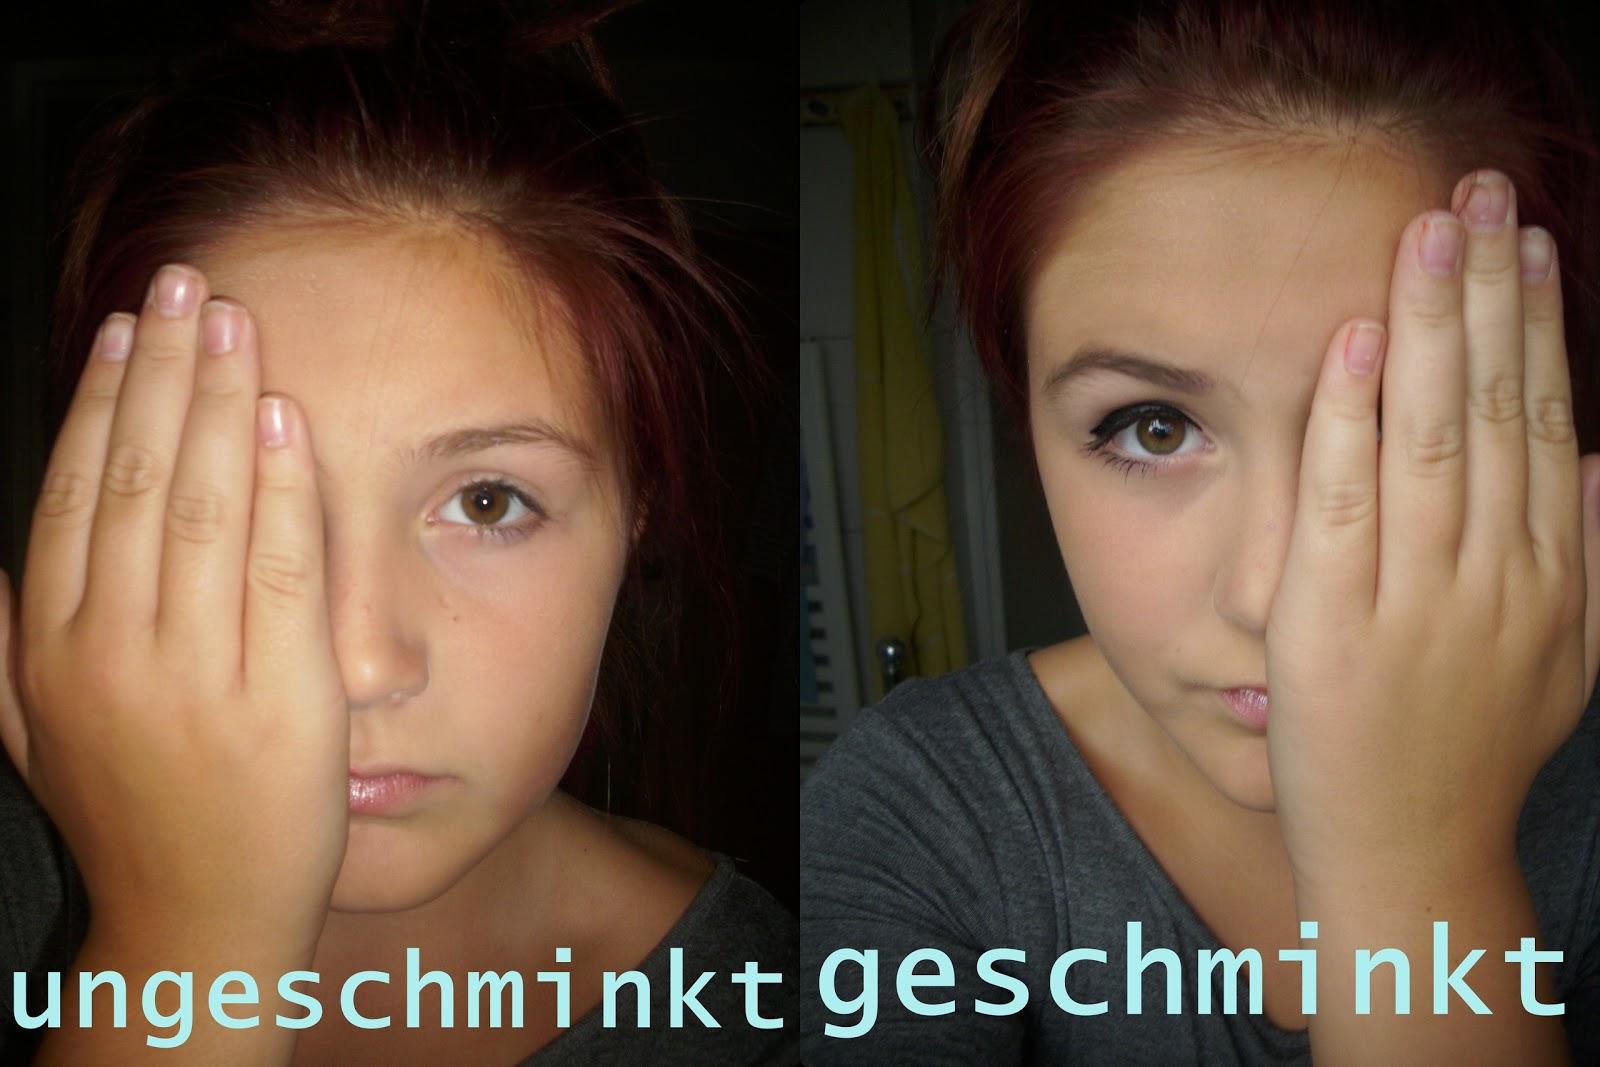 Lucy Beauty: UNGESCHMINKT VS. GESCHMINKT